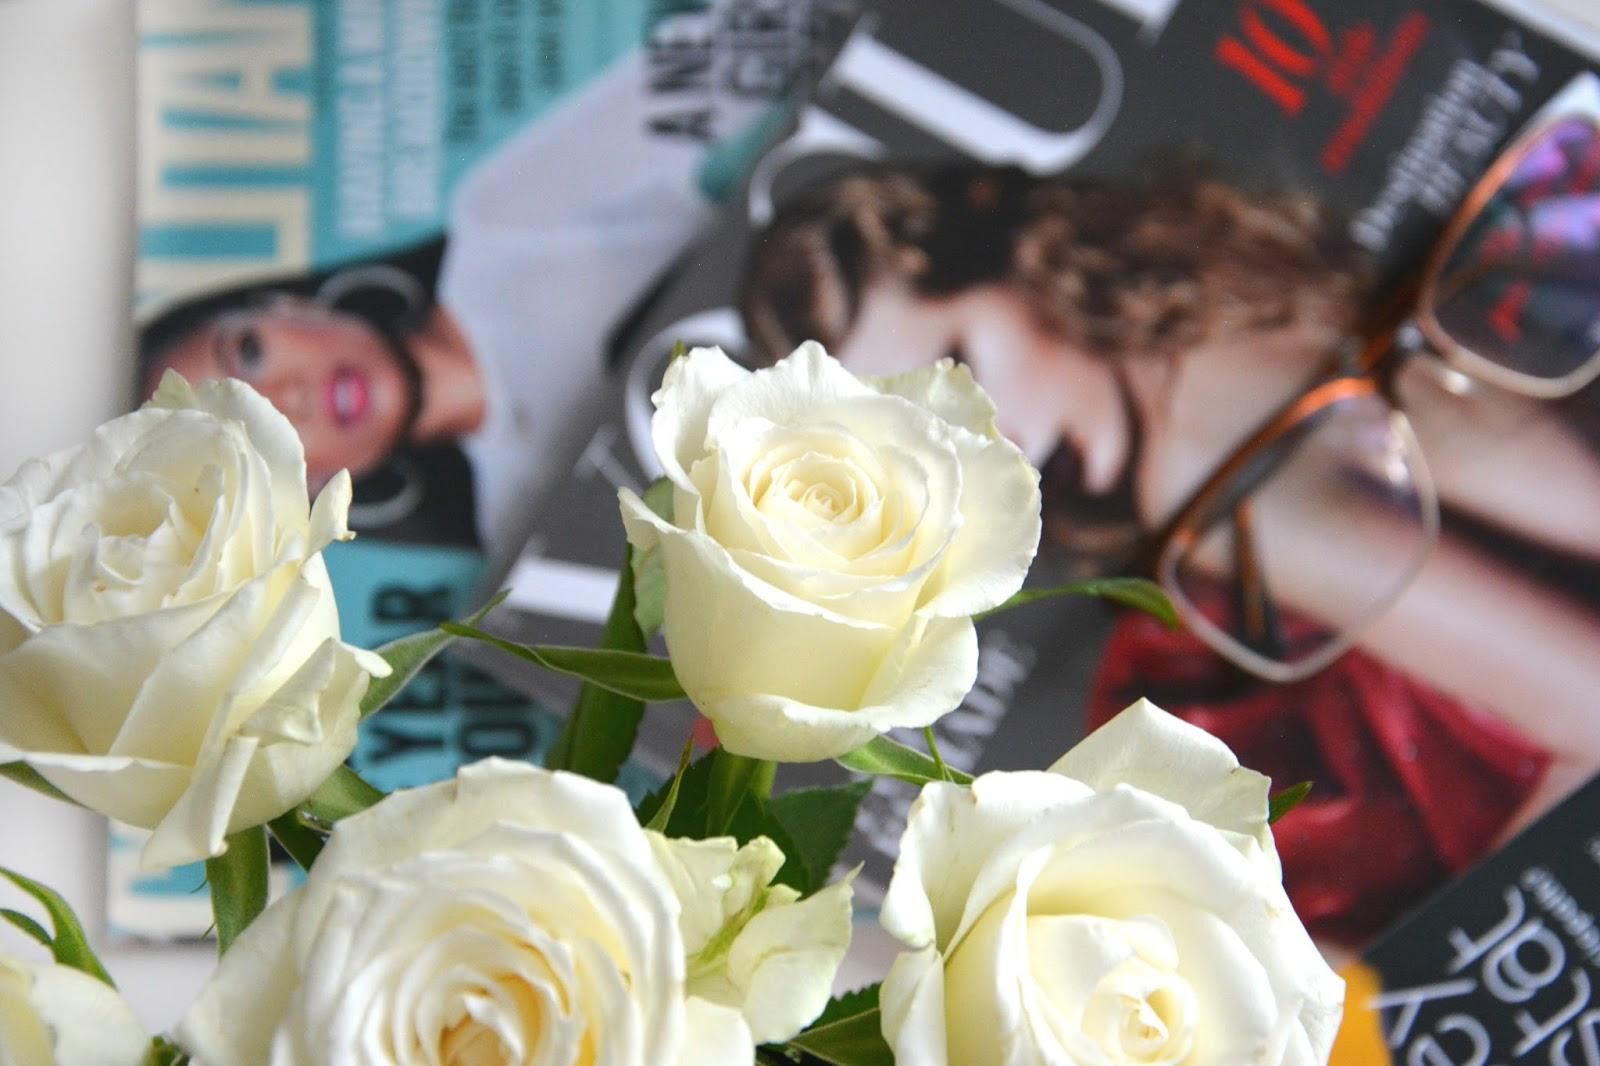 Blogosphere; Vogue; Cosmopolitan; Glasseshop.com Glasses; Huda Beauty Contour & Strobe Set Muse & Angelic; Maisons Du Monde Pineapple Dish; Primark Rings; Fresh Roses